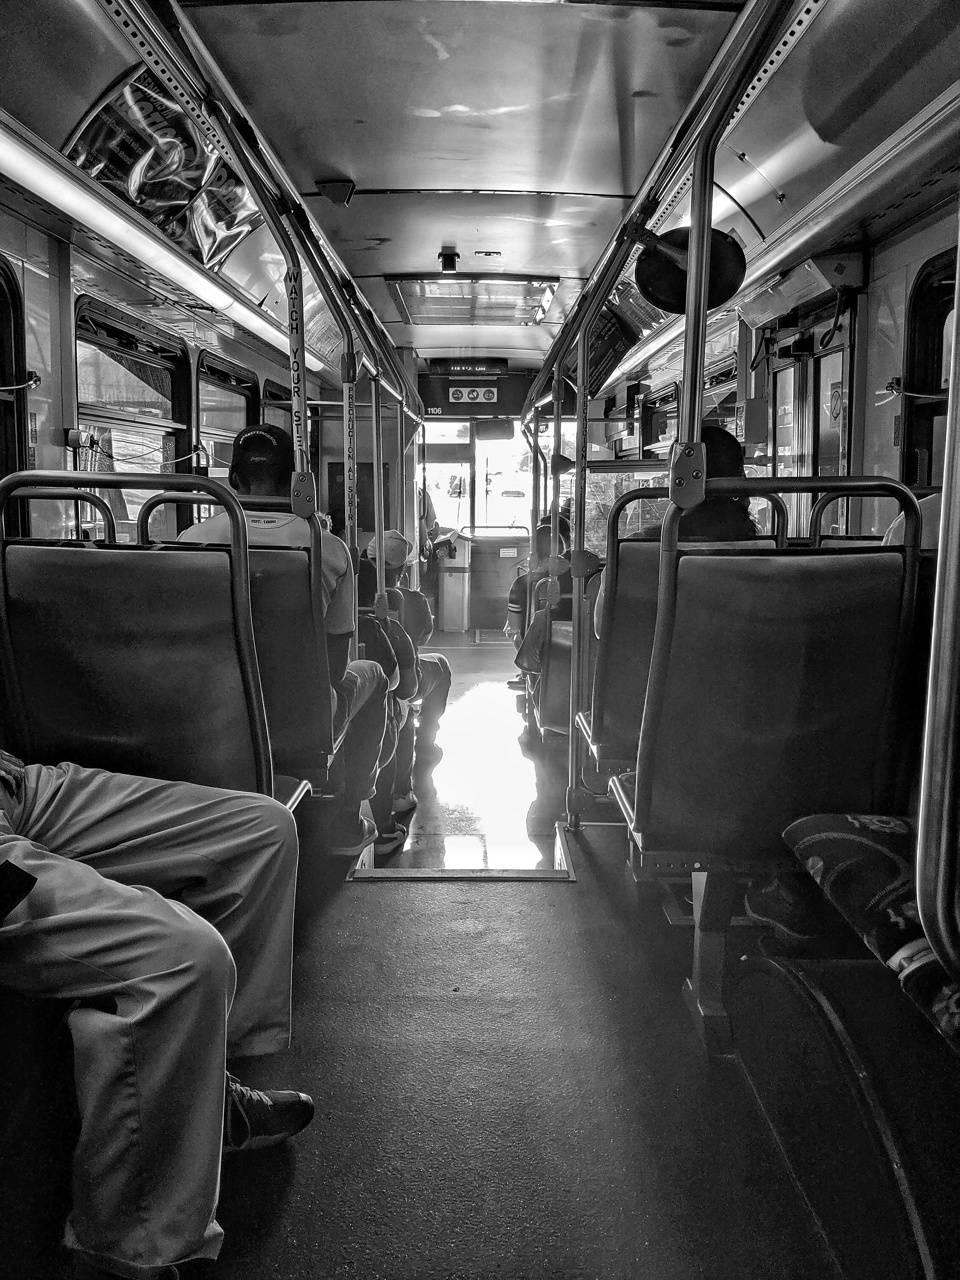 Bus ride blues